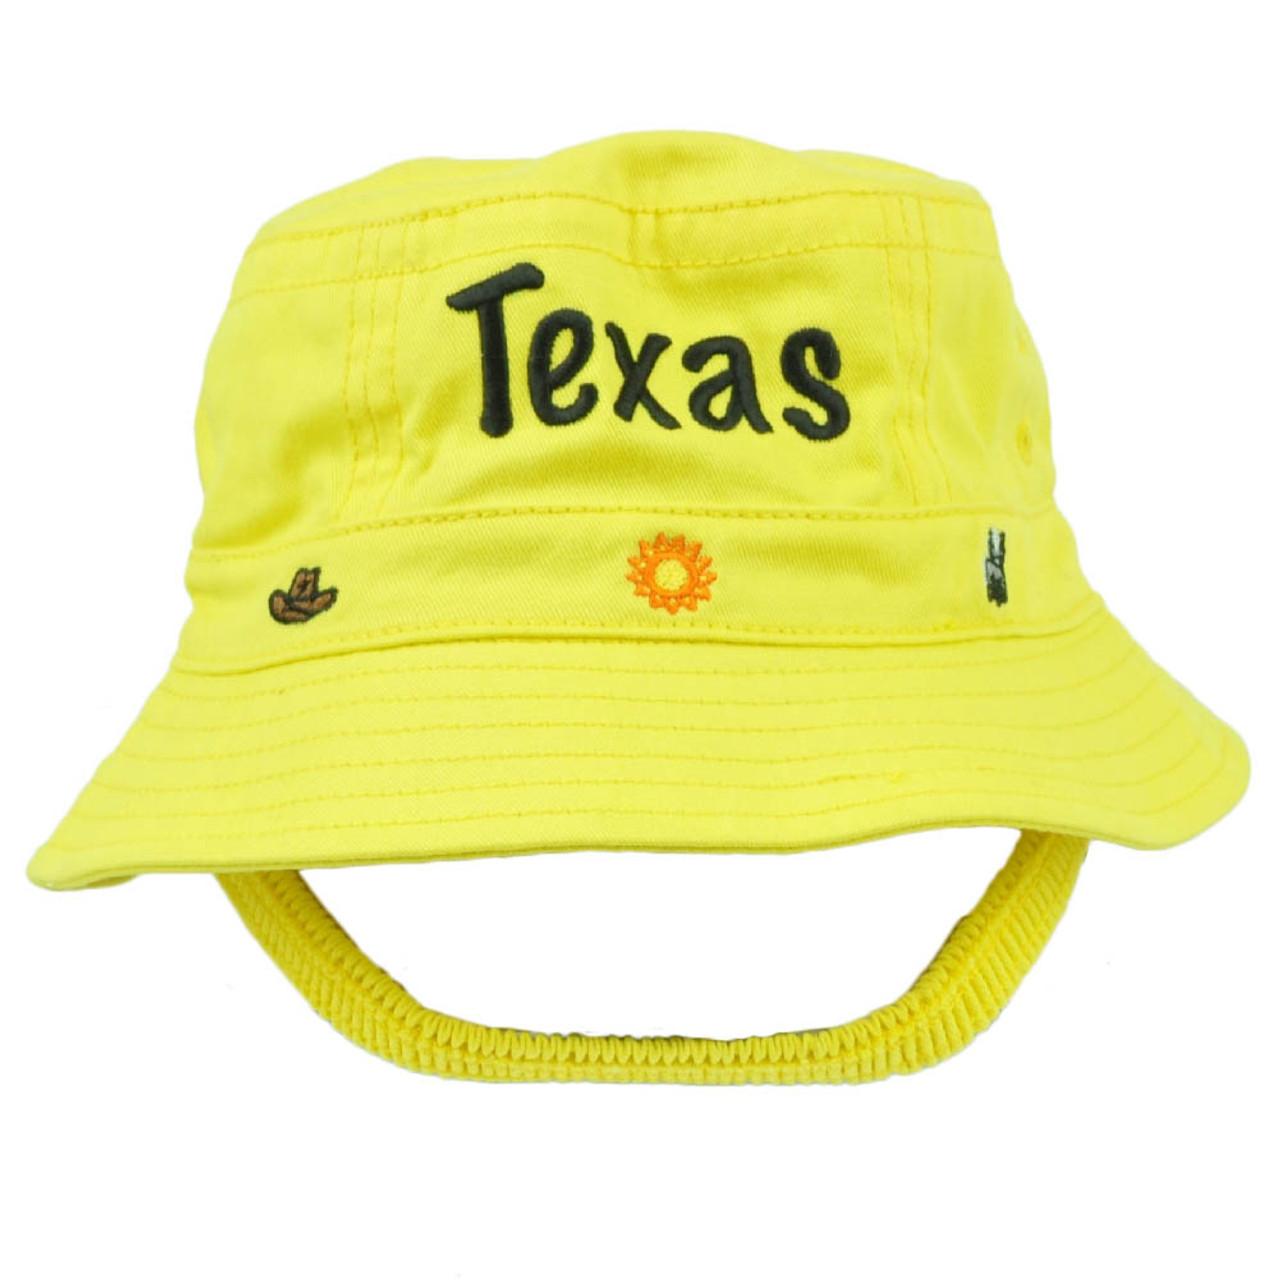 7e07754f689d9 Texas Big State Cowboys Yellow Sun Bucket Hat Beach Hat Toddler USA America  - Cap Store Online.com